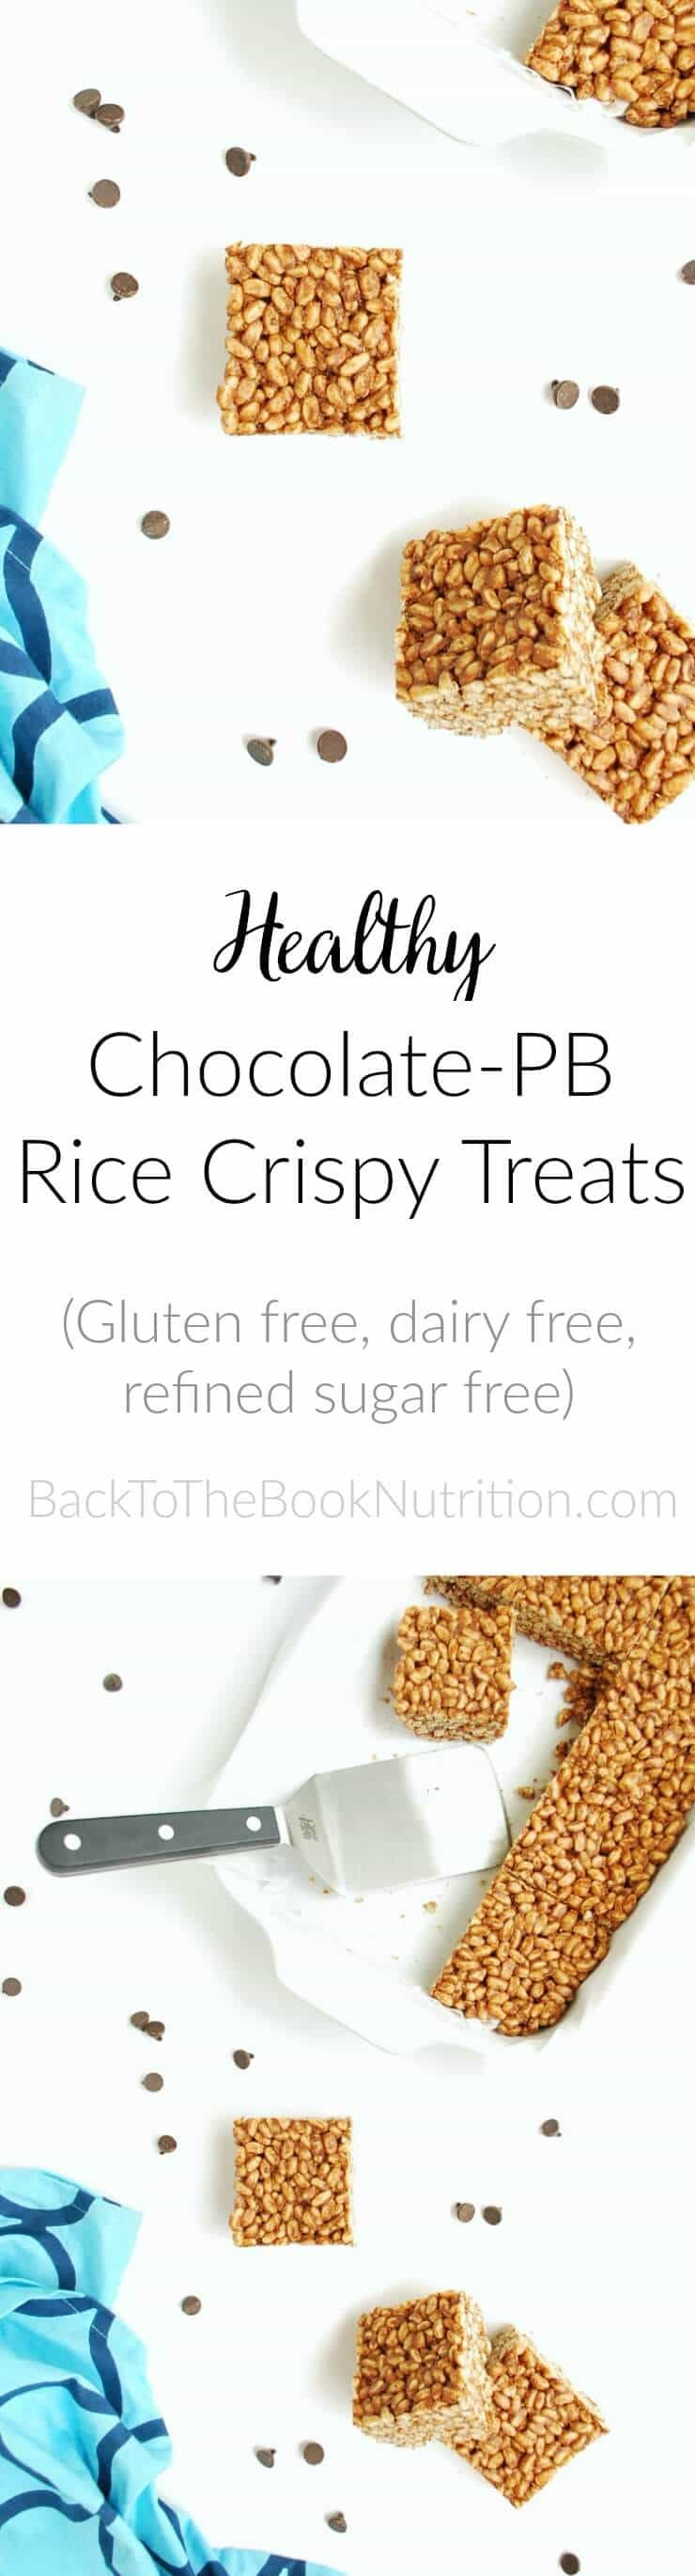 Healthy Chocolate Peanut Butter Rice Crispy Treats (Gluten